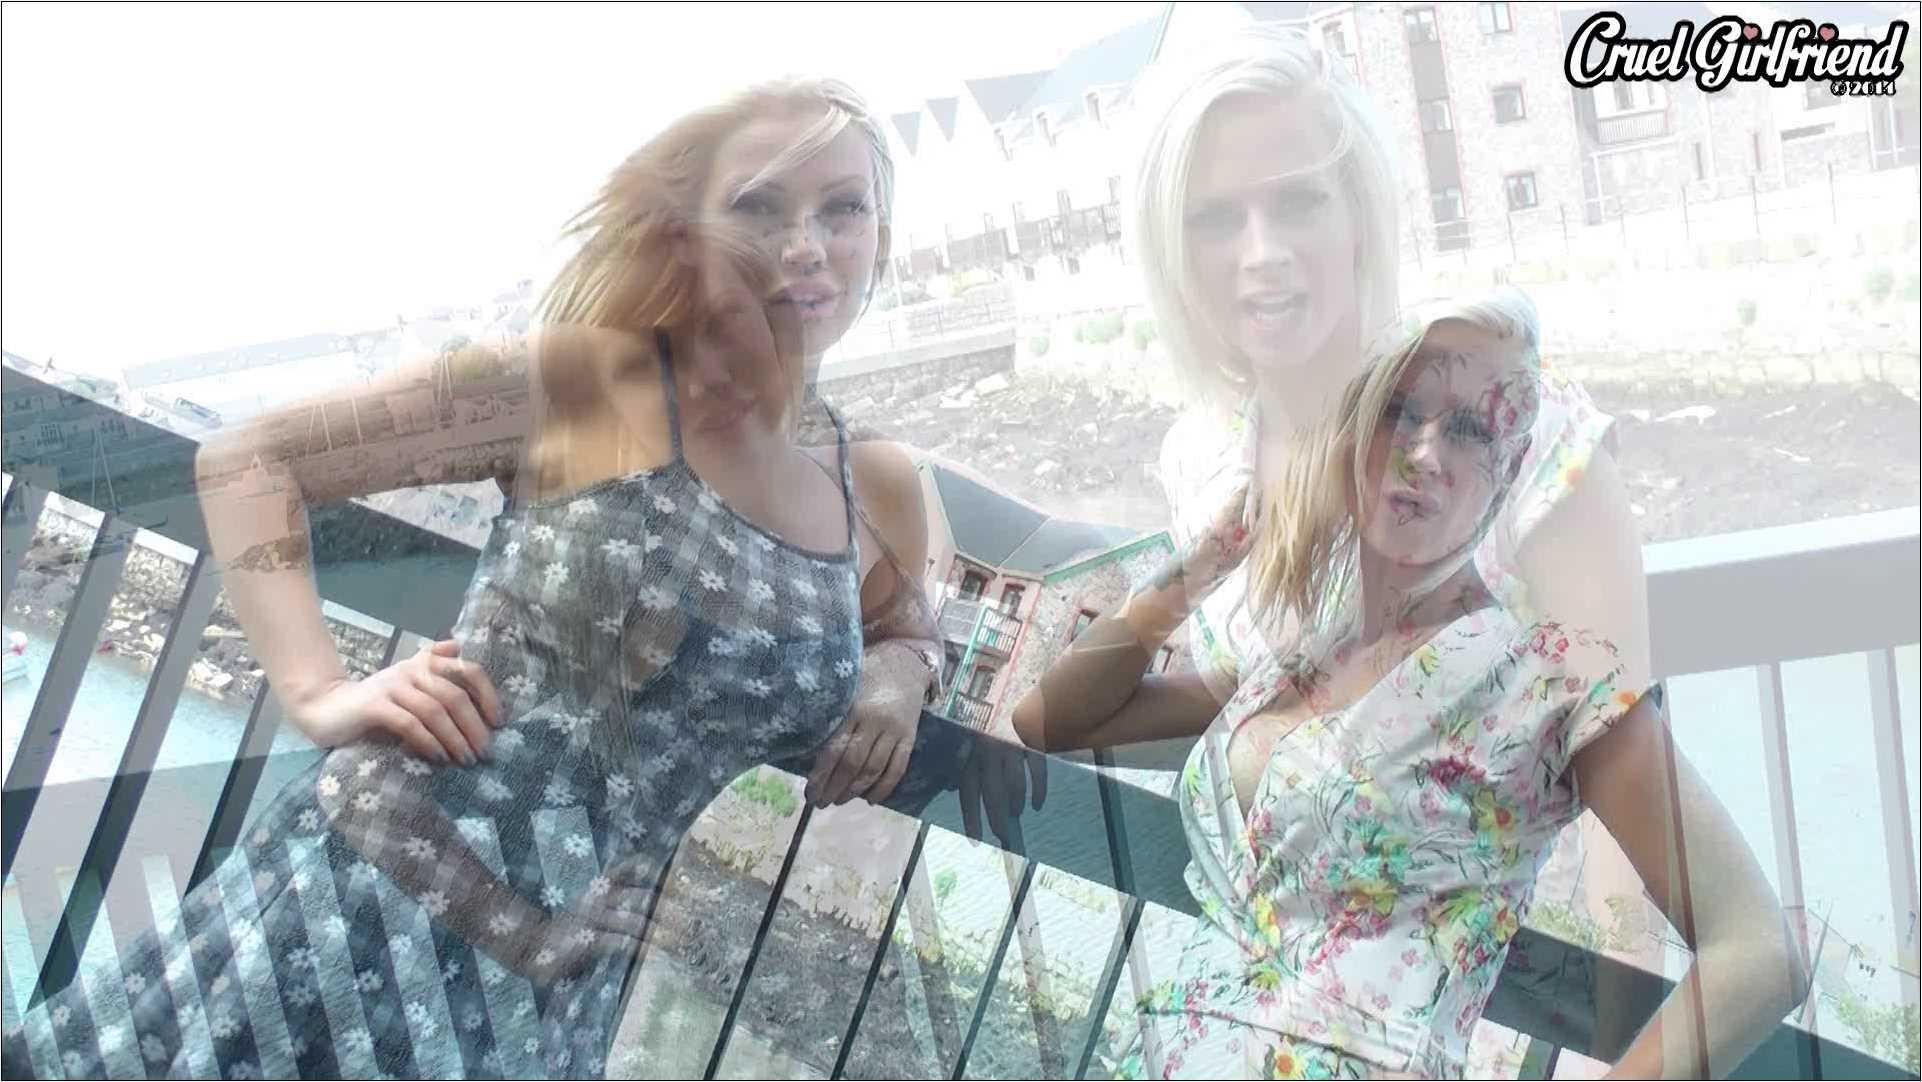 Electra Brooke In Scene: Dressed For The Town - CRUELGF - FULL HD/1080p/WMV